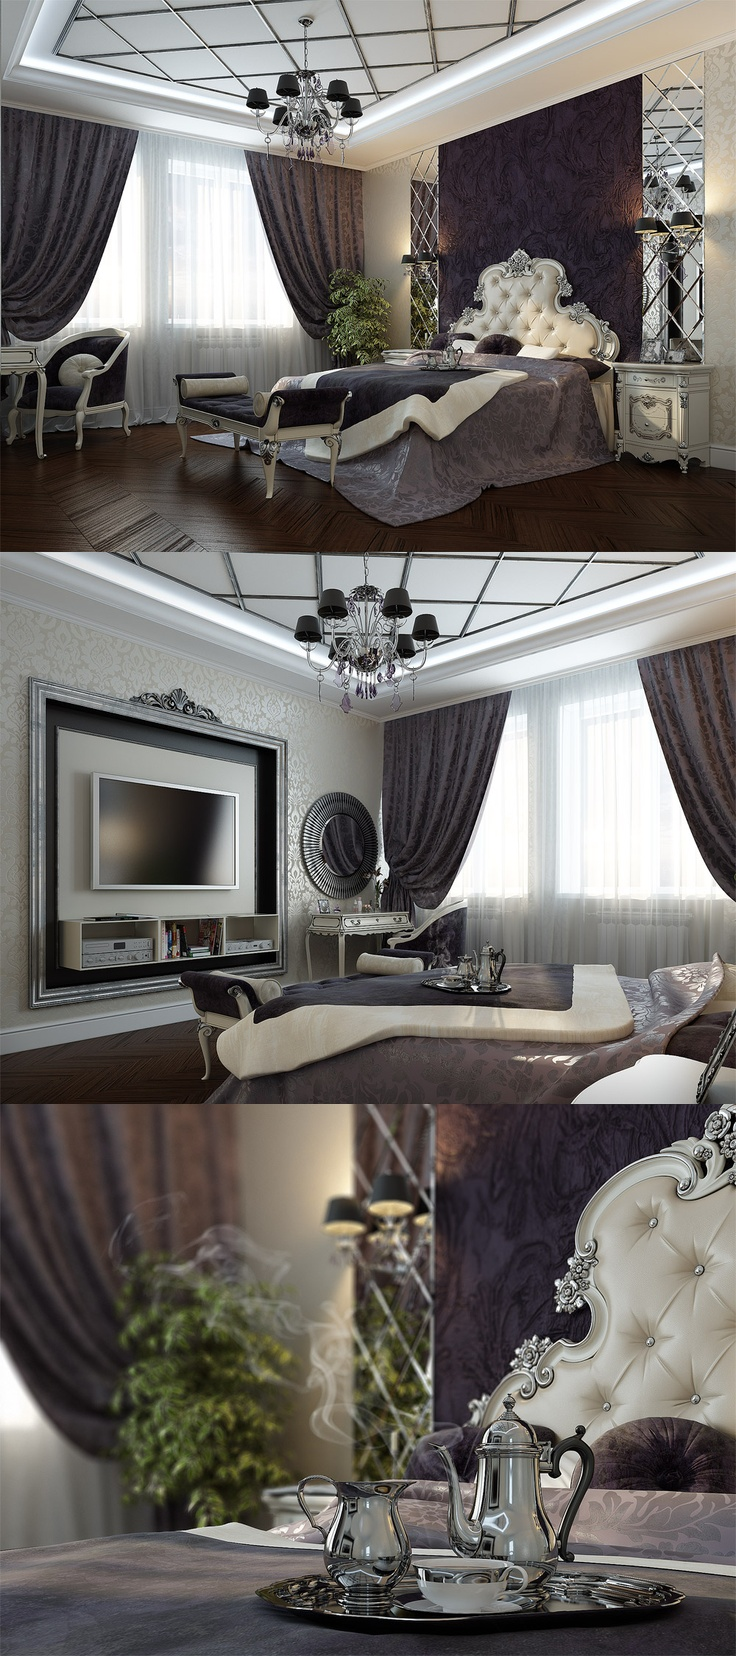 Bedroom Glam master suite